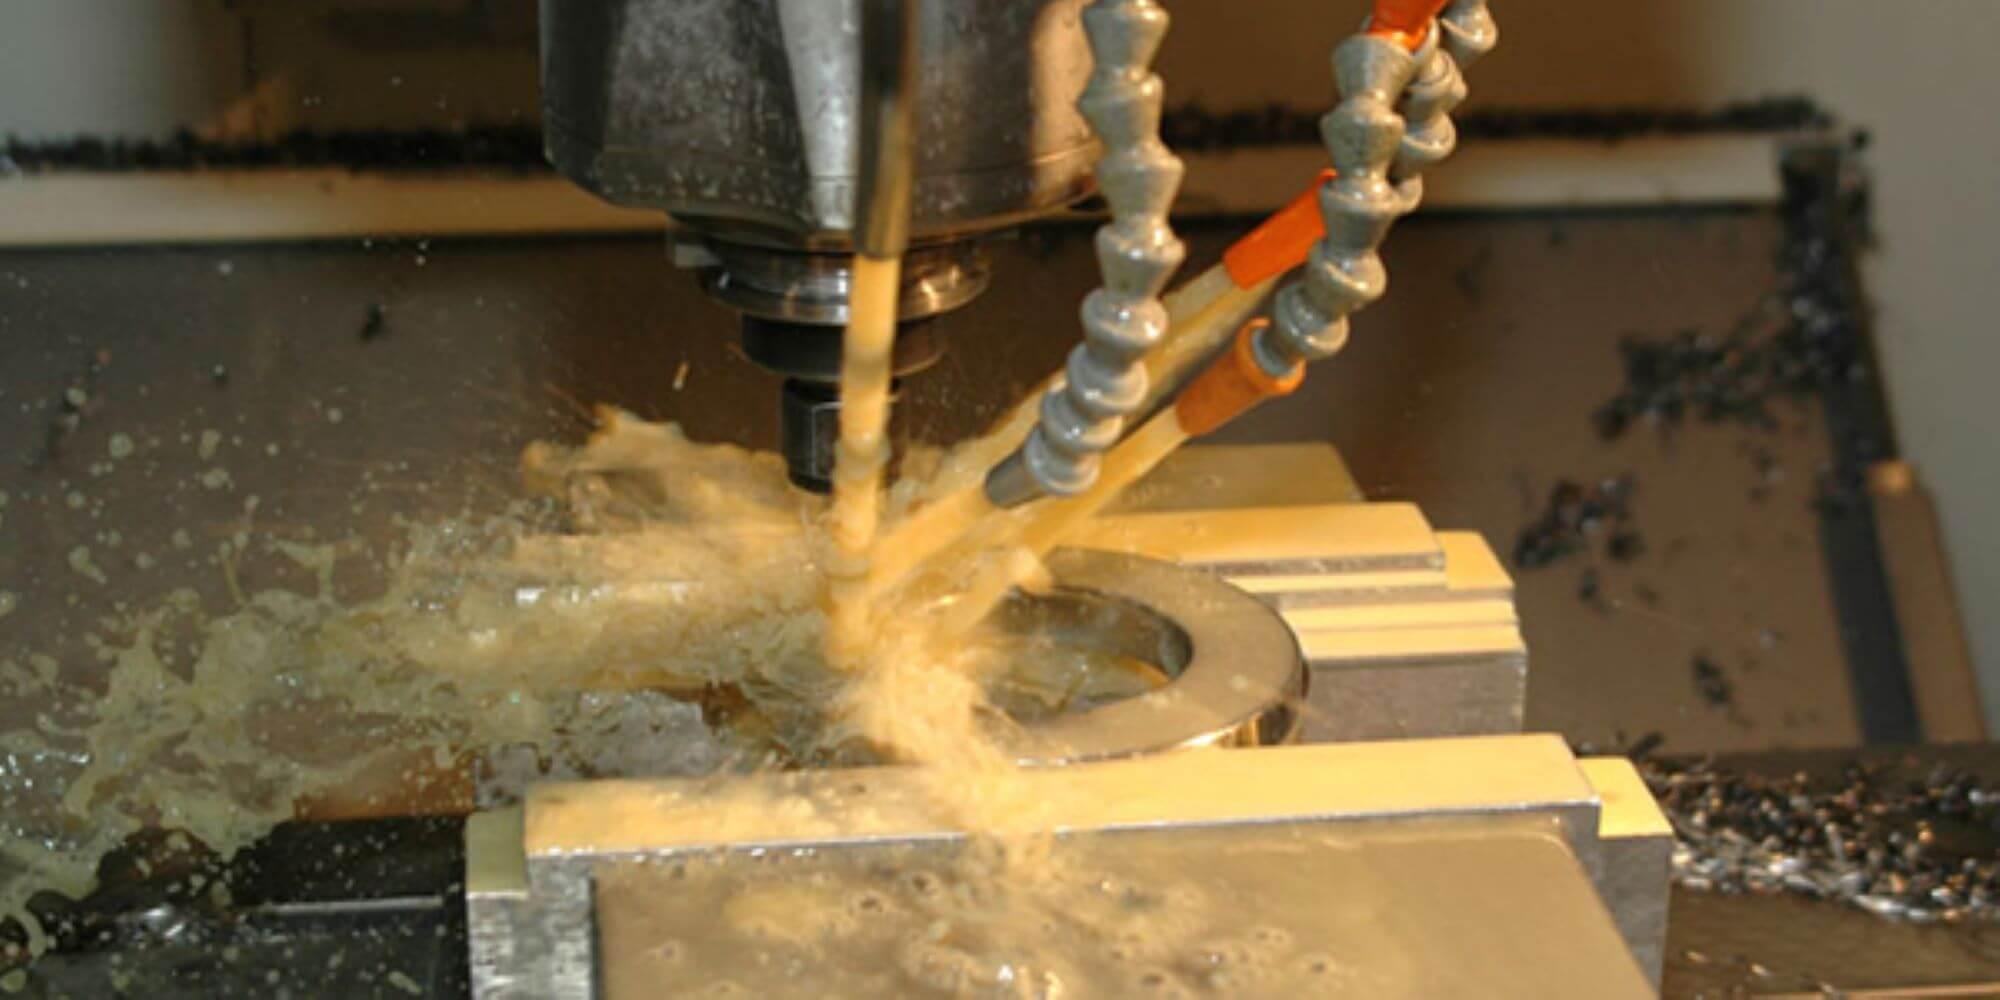 calder machine, cnc machining